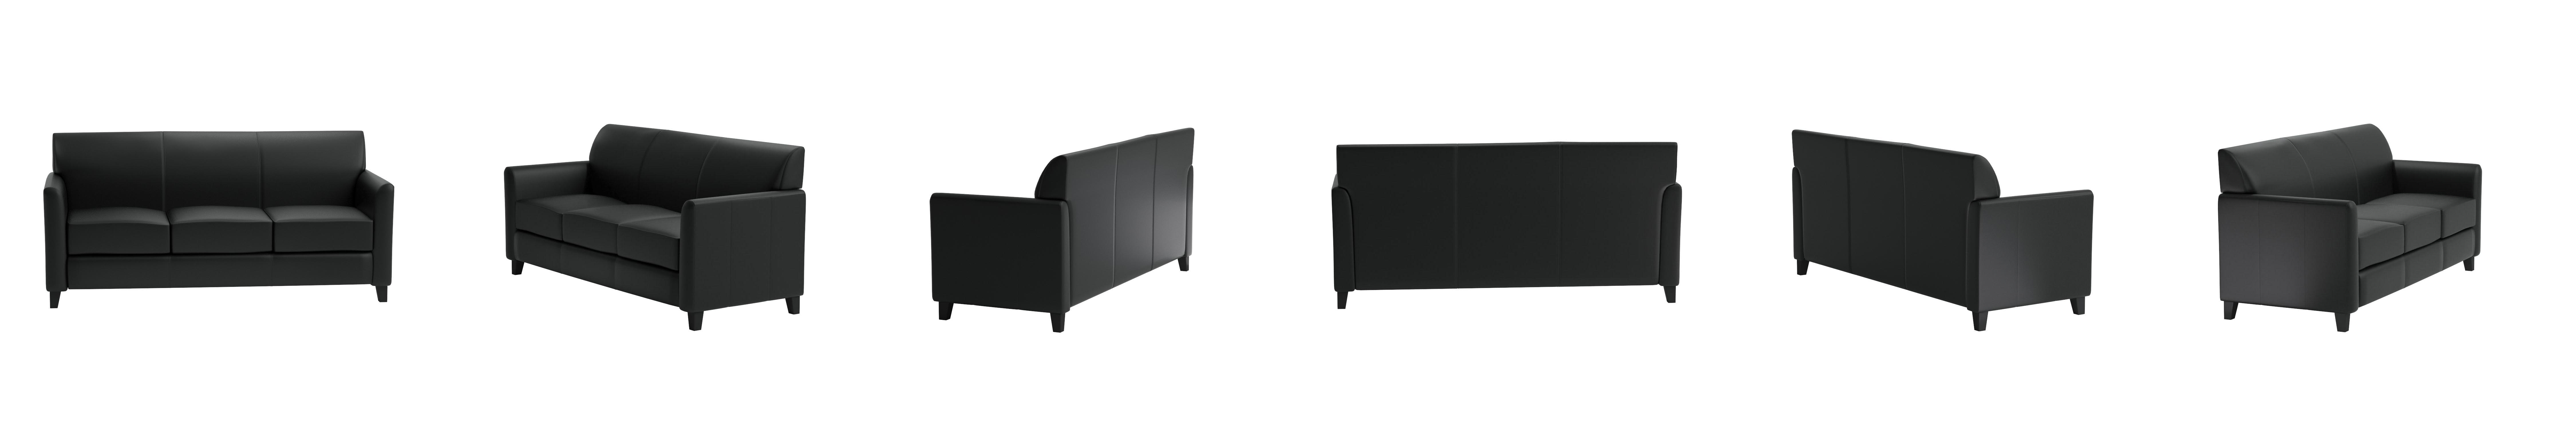 amazon com flash furniture hercules diplomat series black leather